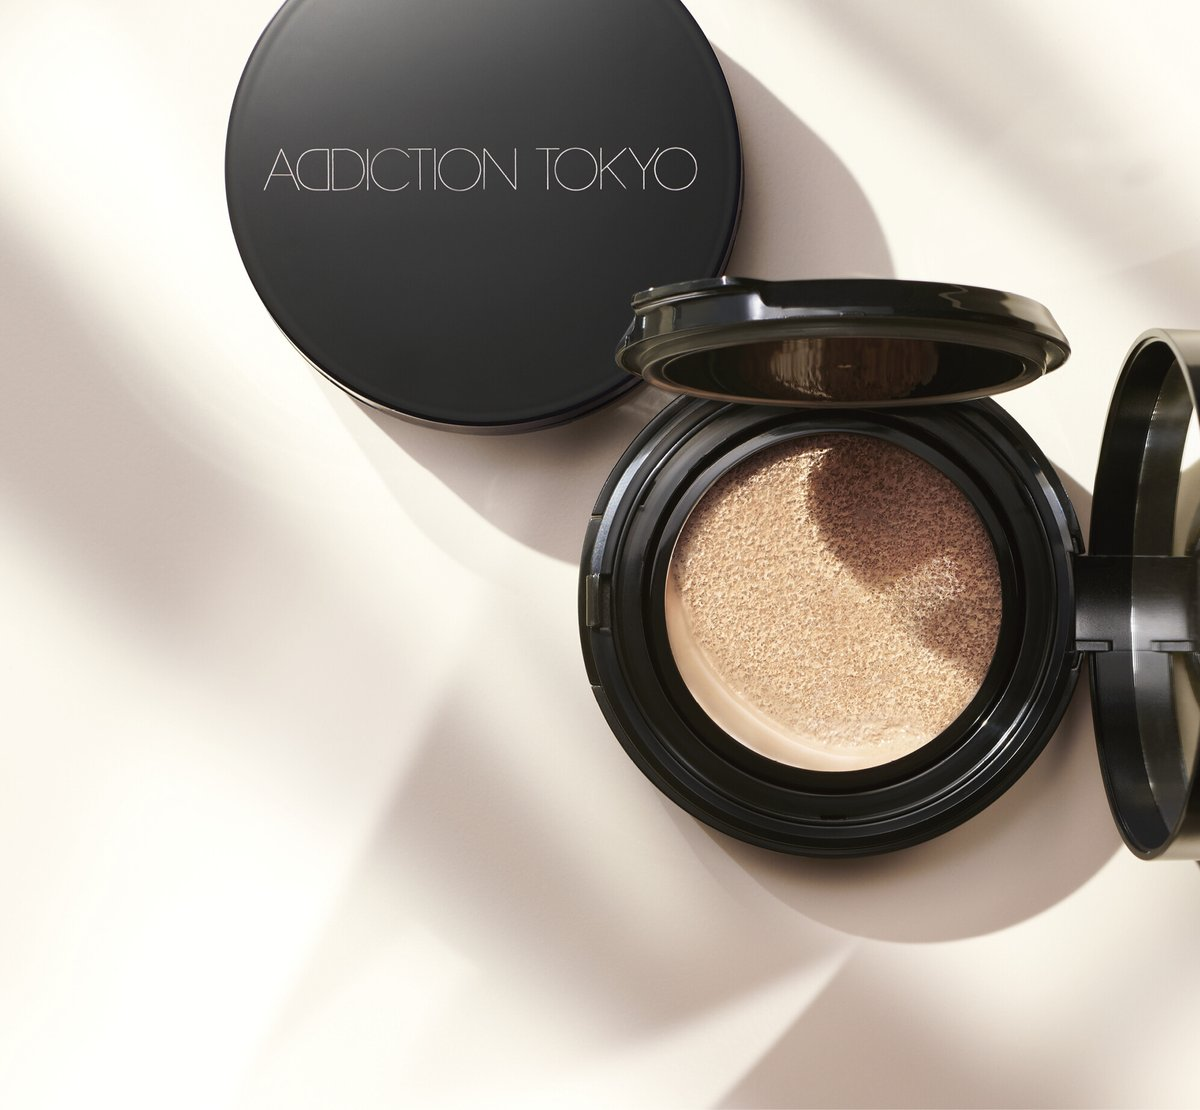 "test ツイッターメディア - 【明日予約開始】 SKIN REFLECT スキンリフレクト ラスティング UV クッションファンデーション 全6色  隠すことにとらわれず、光を反射させ素肌のような""素肌膜""を作り出すクッションファンデーション。  4月23日(金)全国発売 Maison KOSÉ表参道店では先行予約受付中!  #アディクション https://t.co/PAFLwI0J6g"